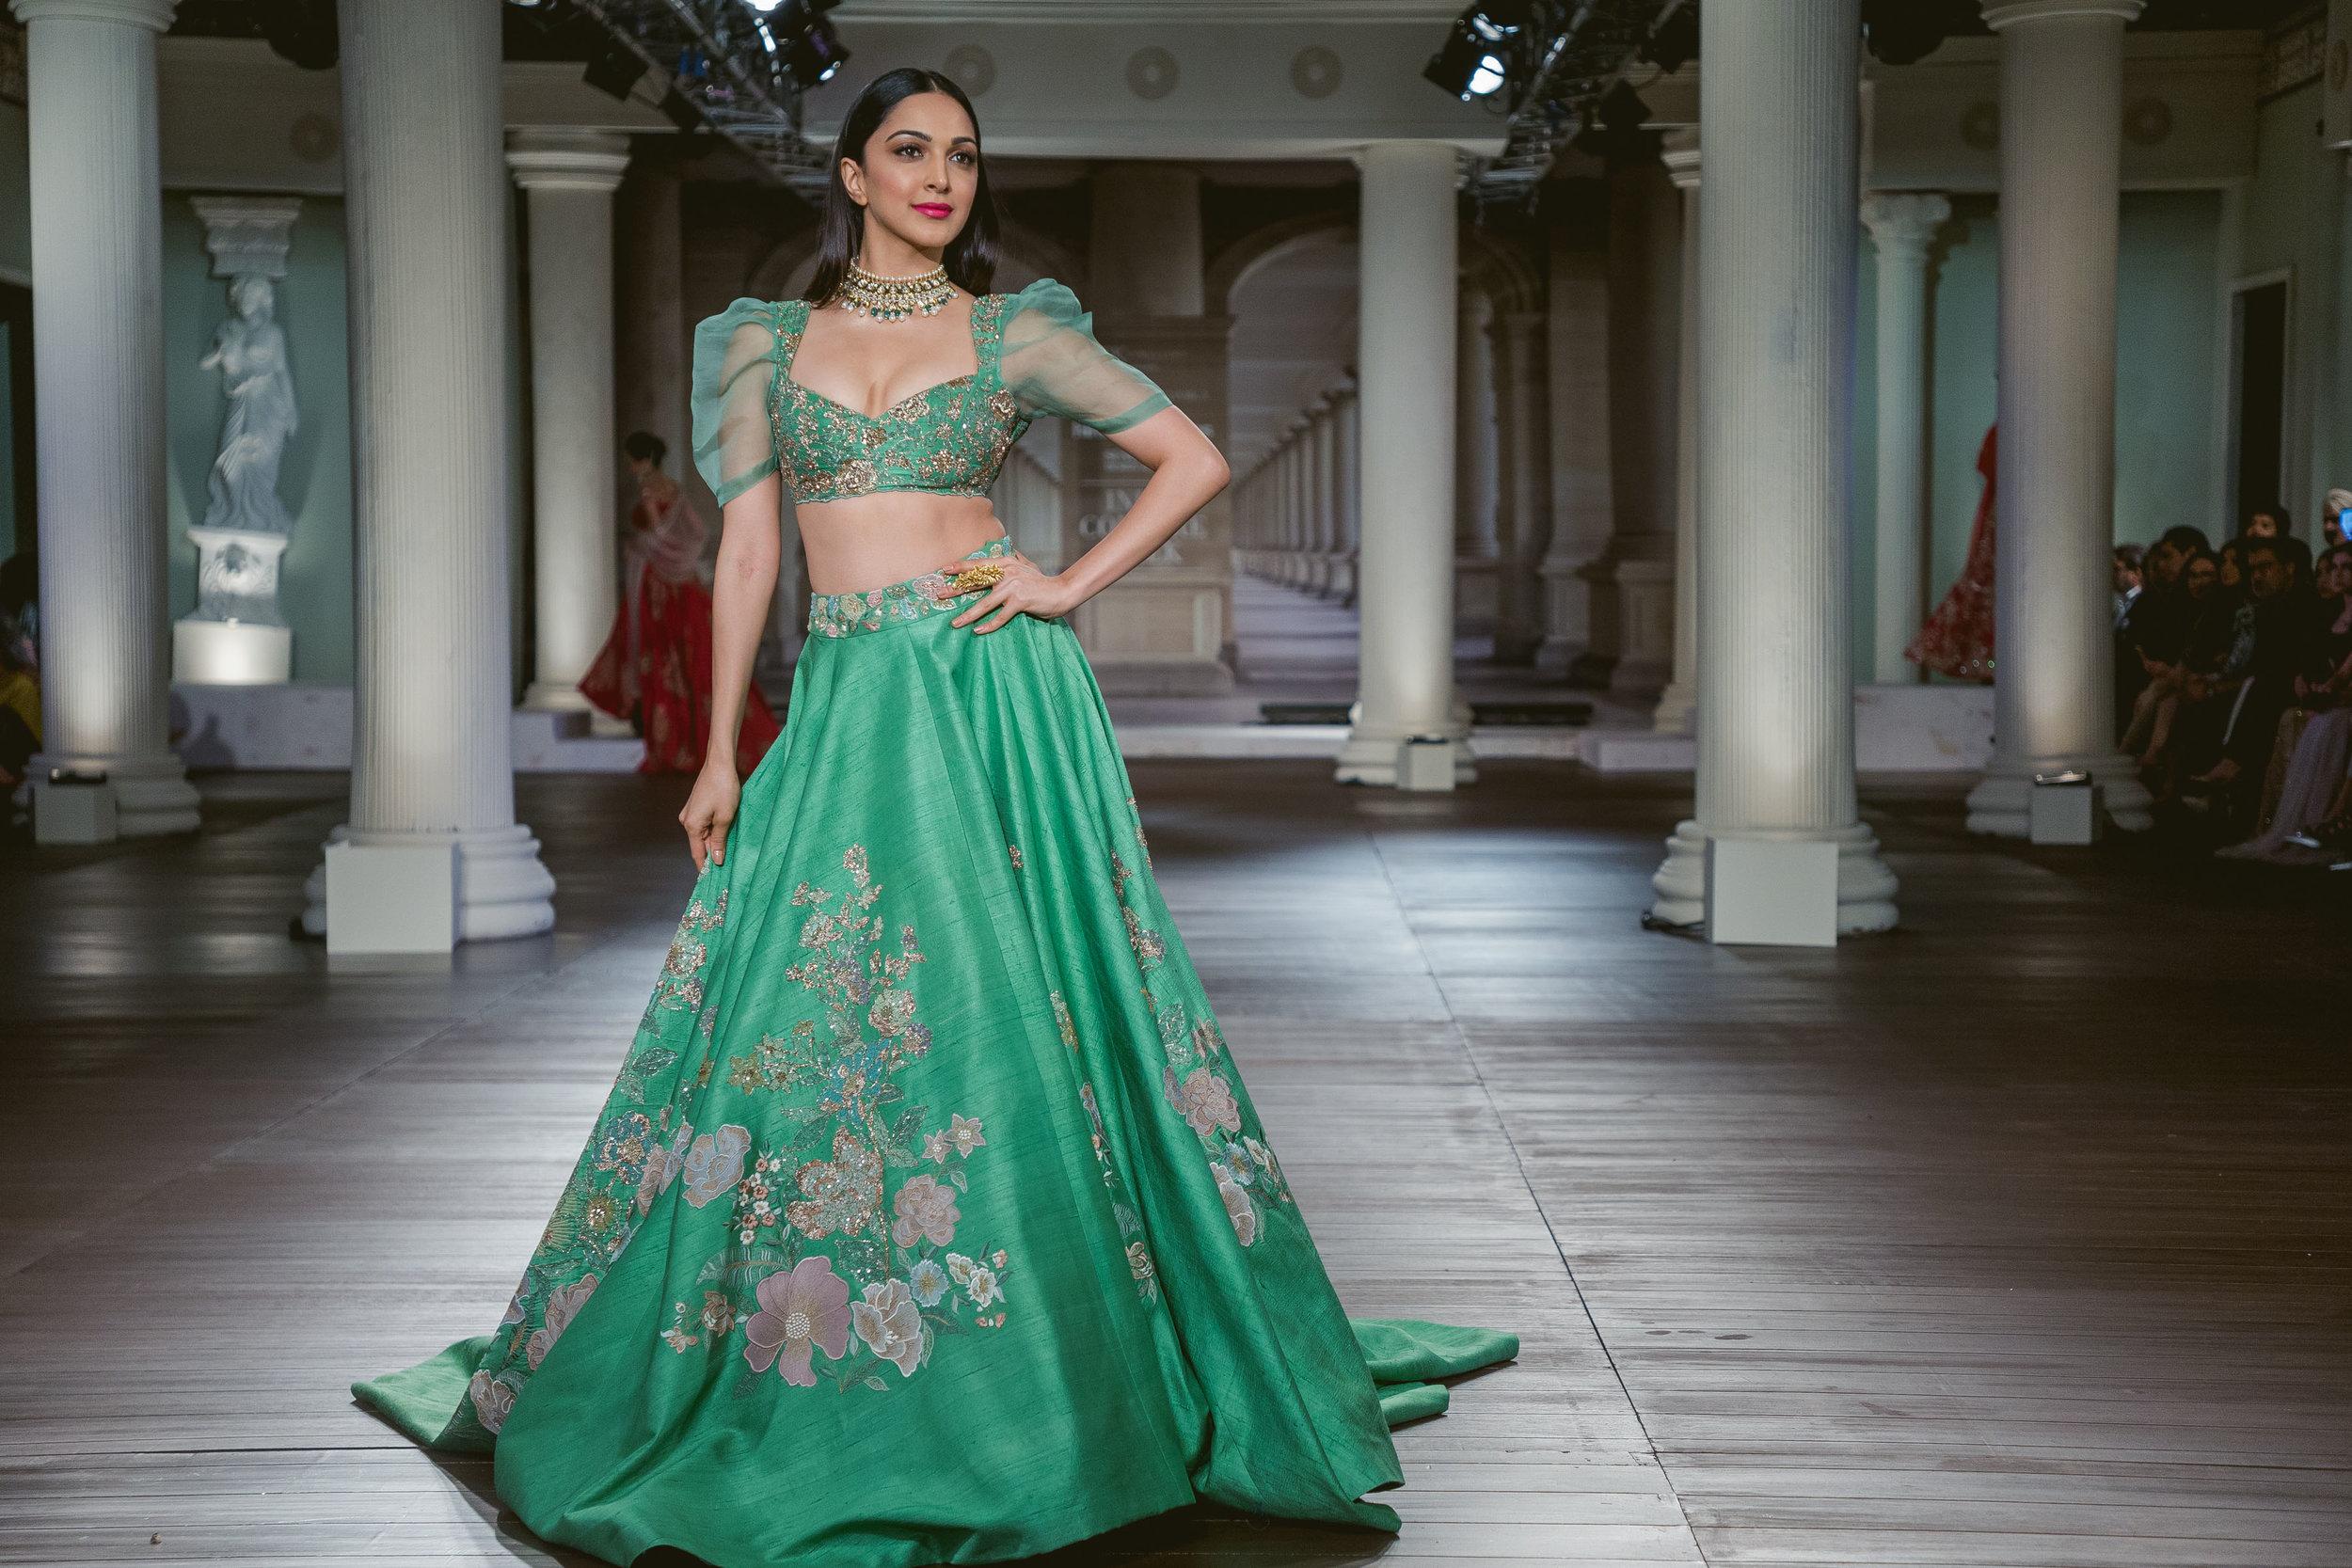 Kiara Advani looking regal in Shyamal and Bhumika couture.